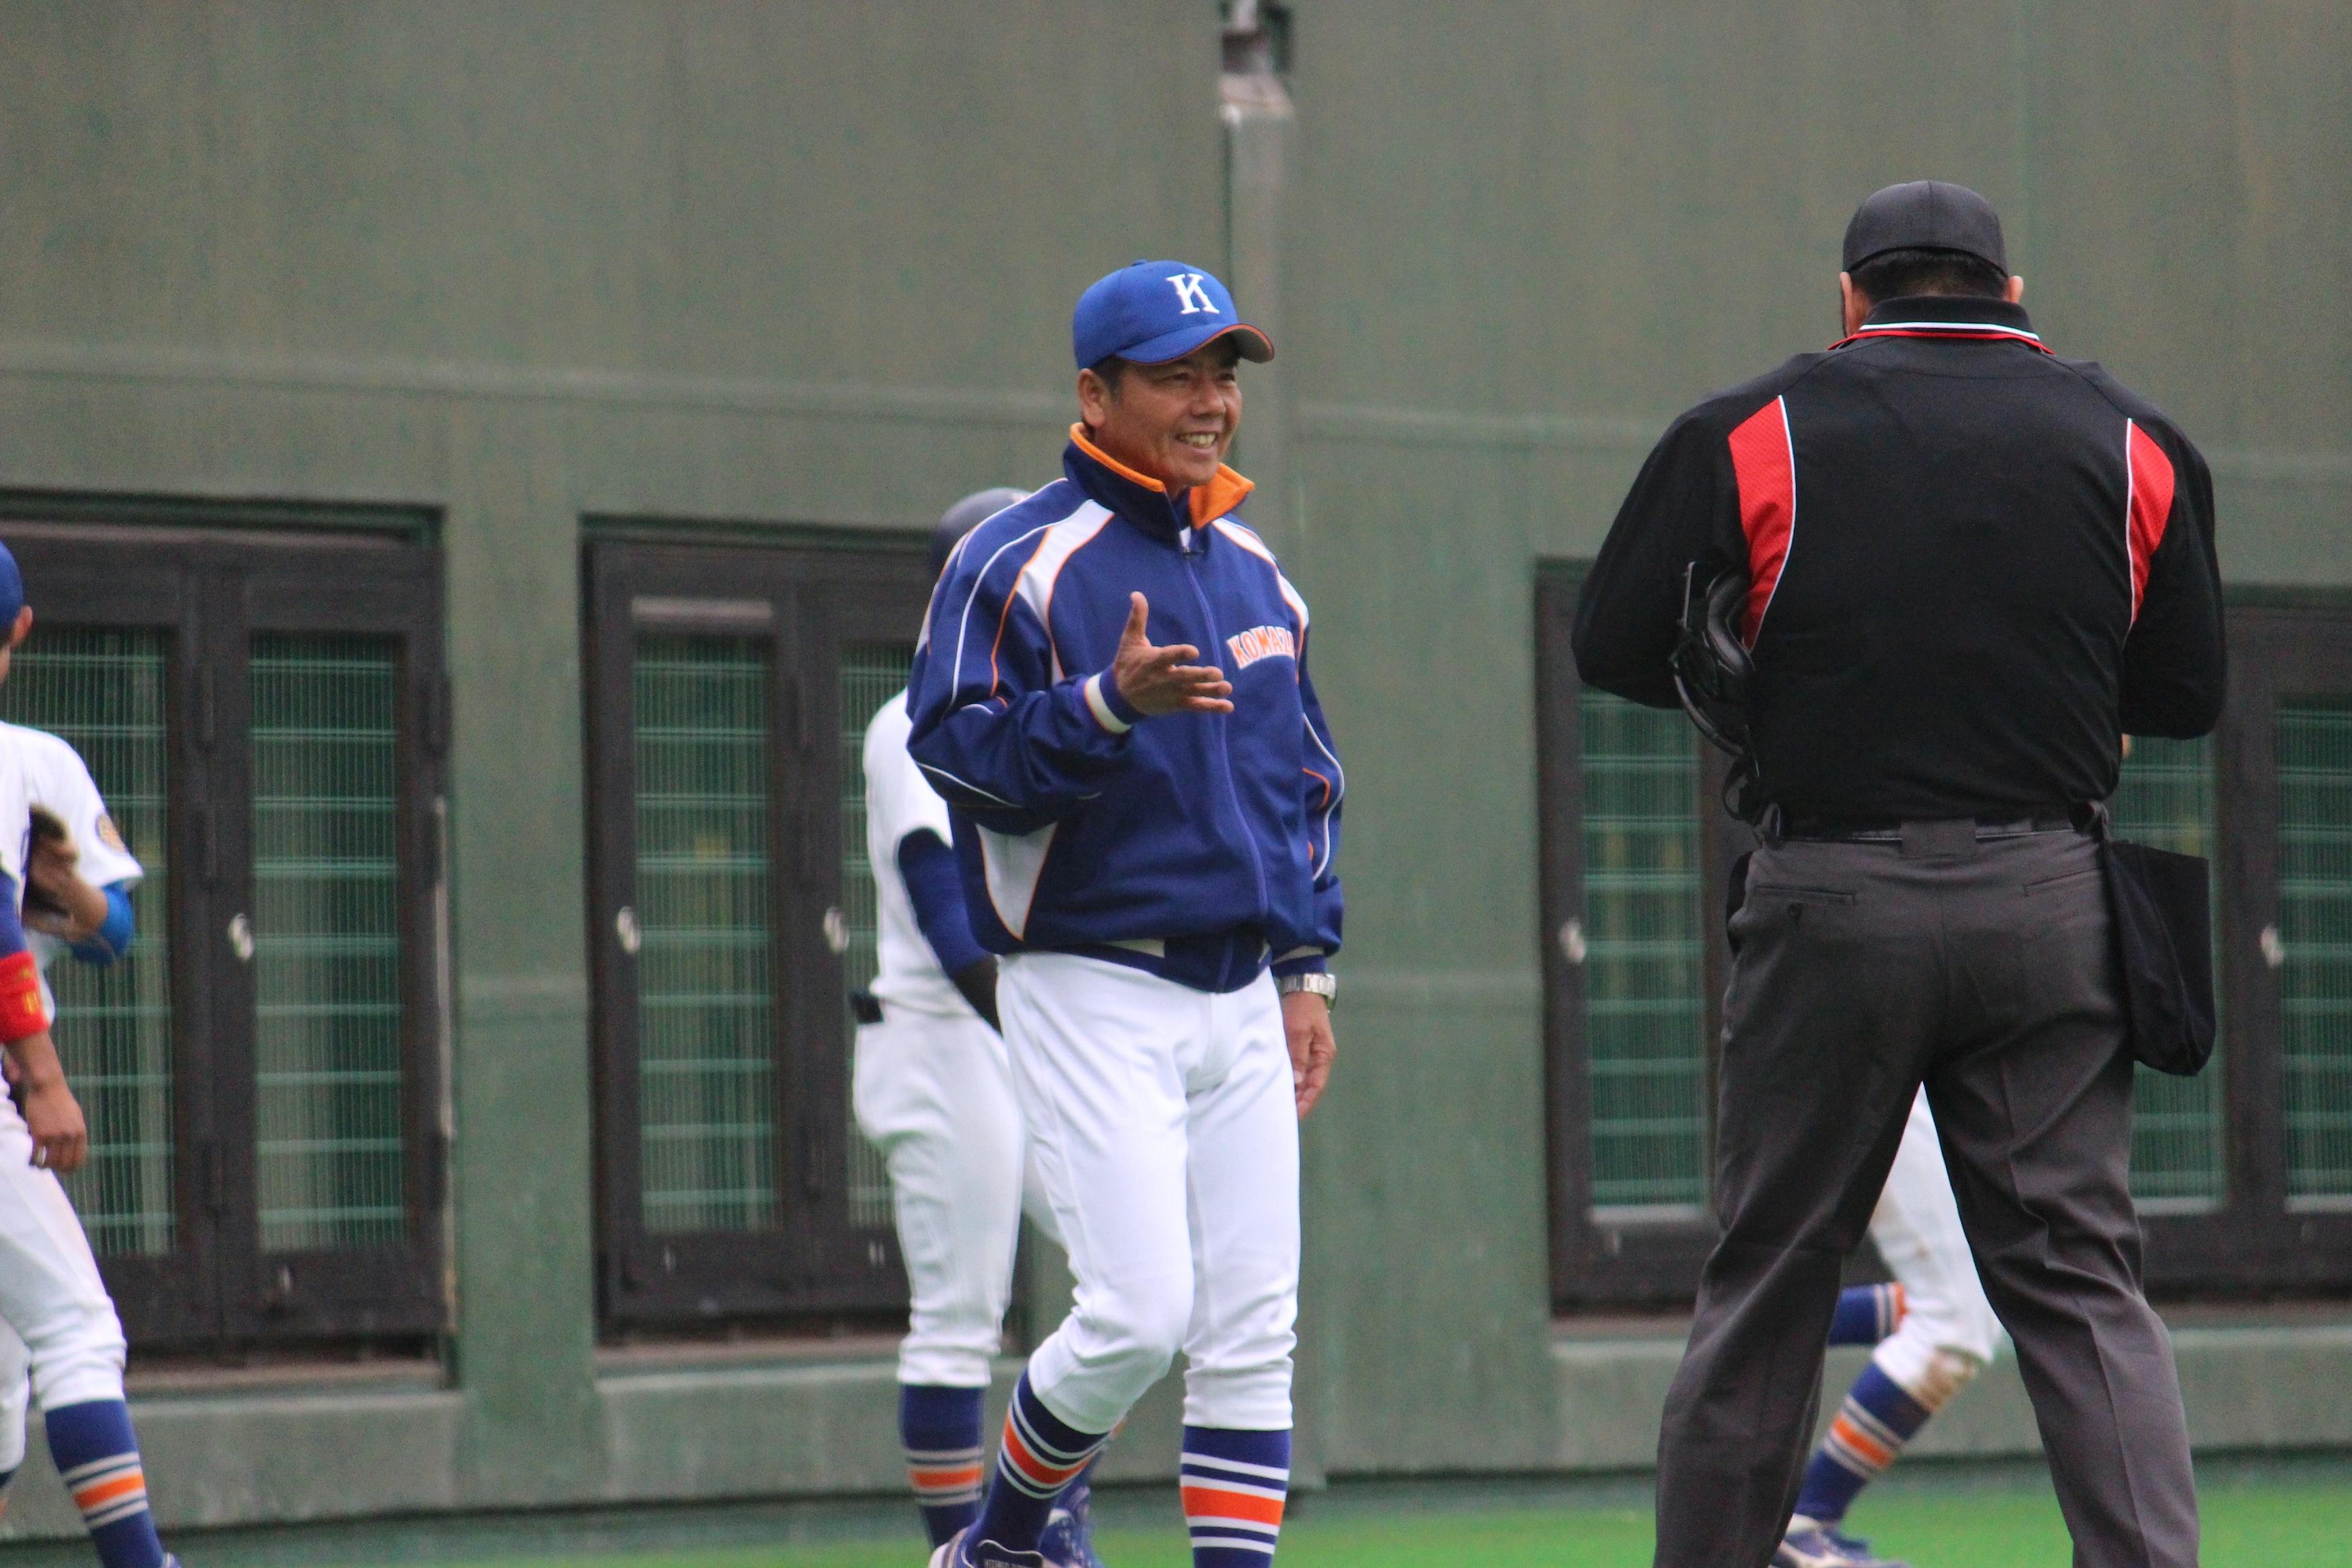 駒澤 大学 駅伝 2ch